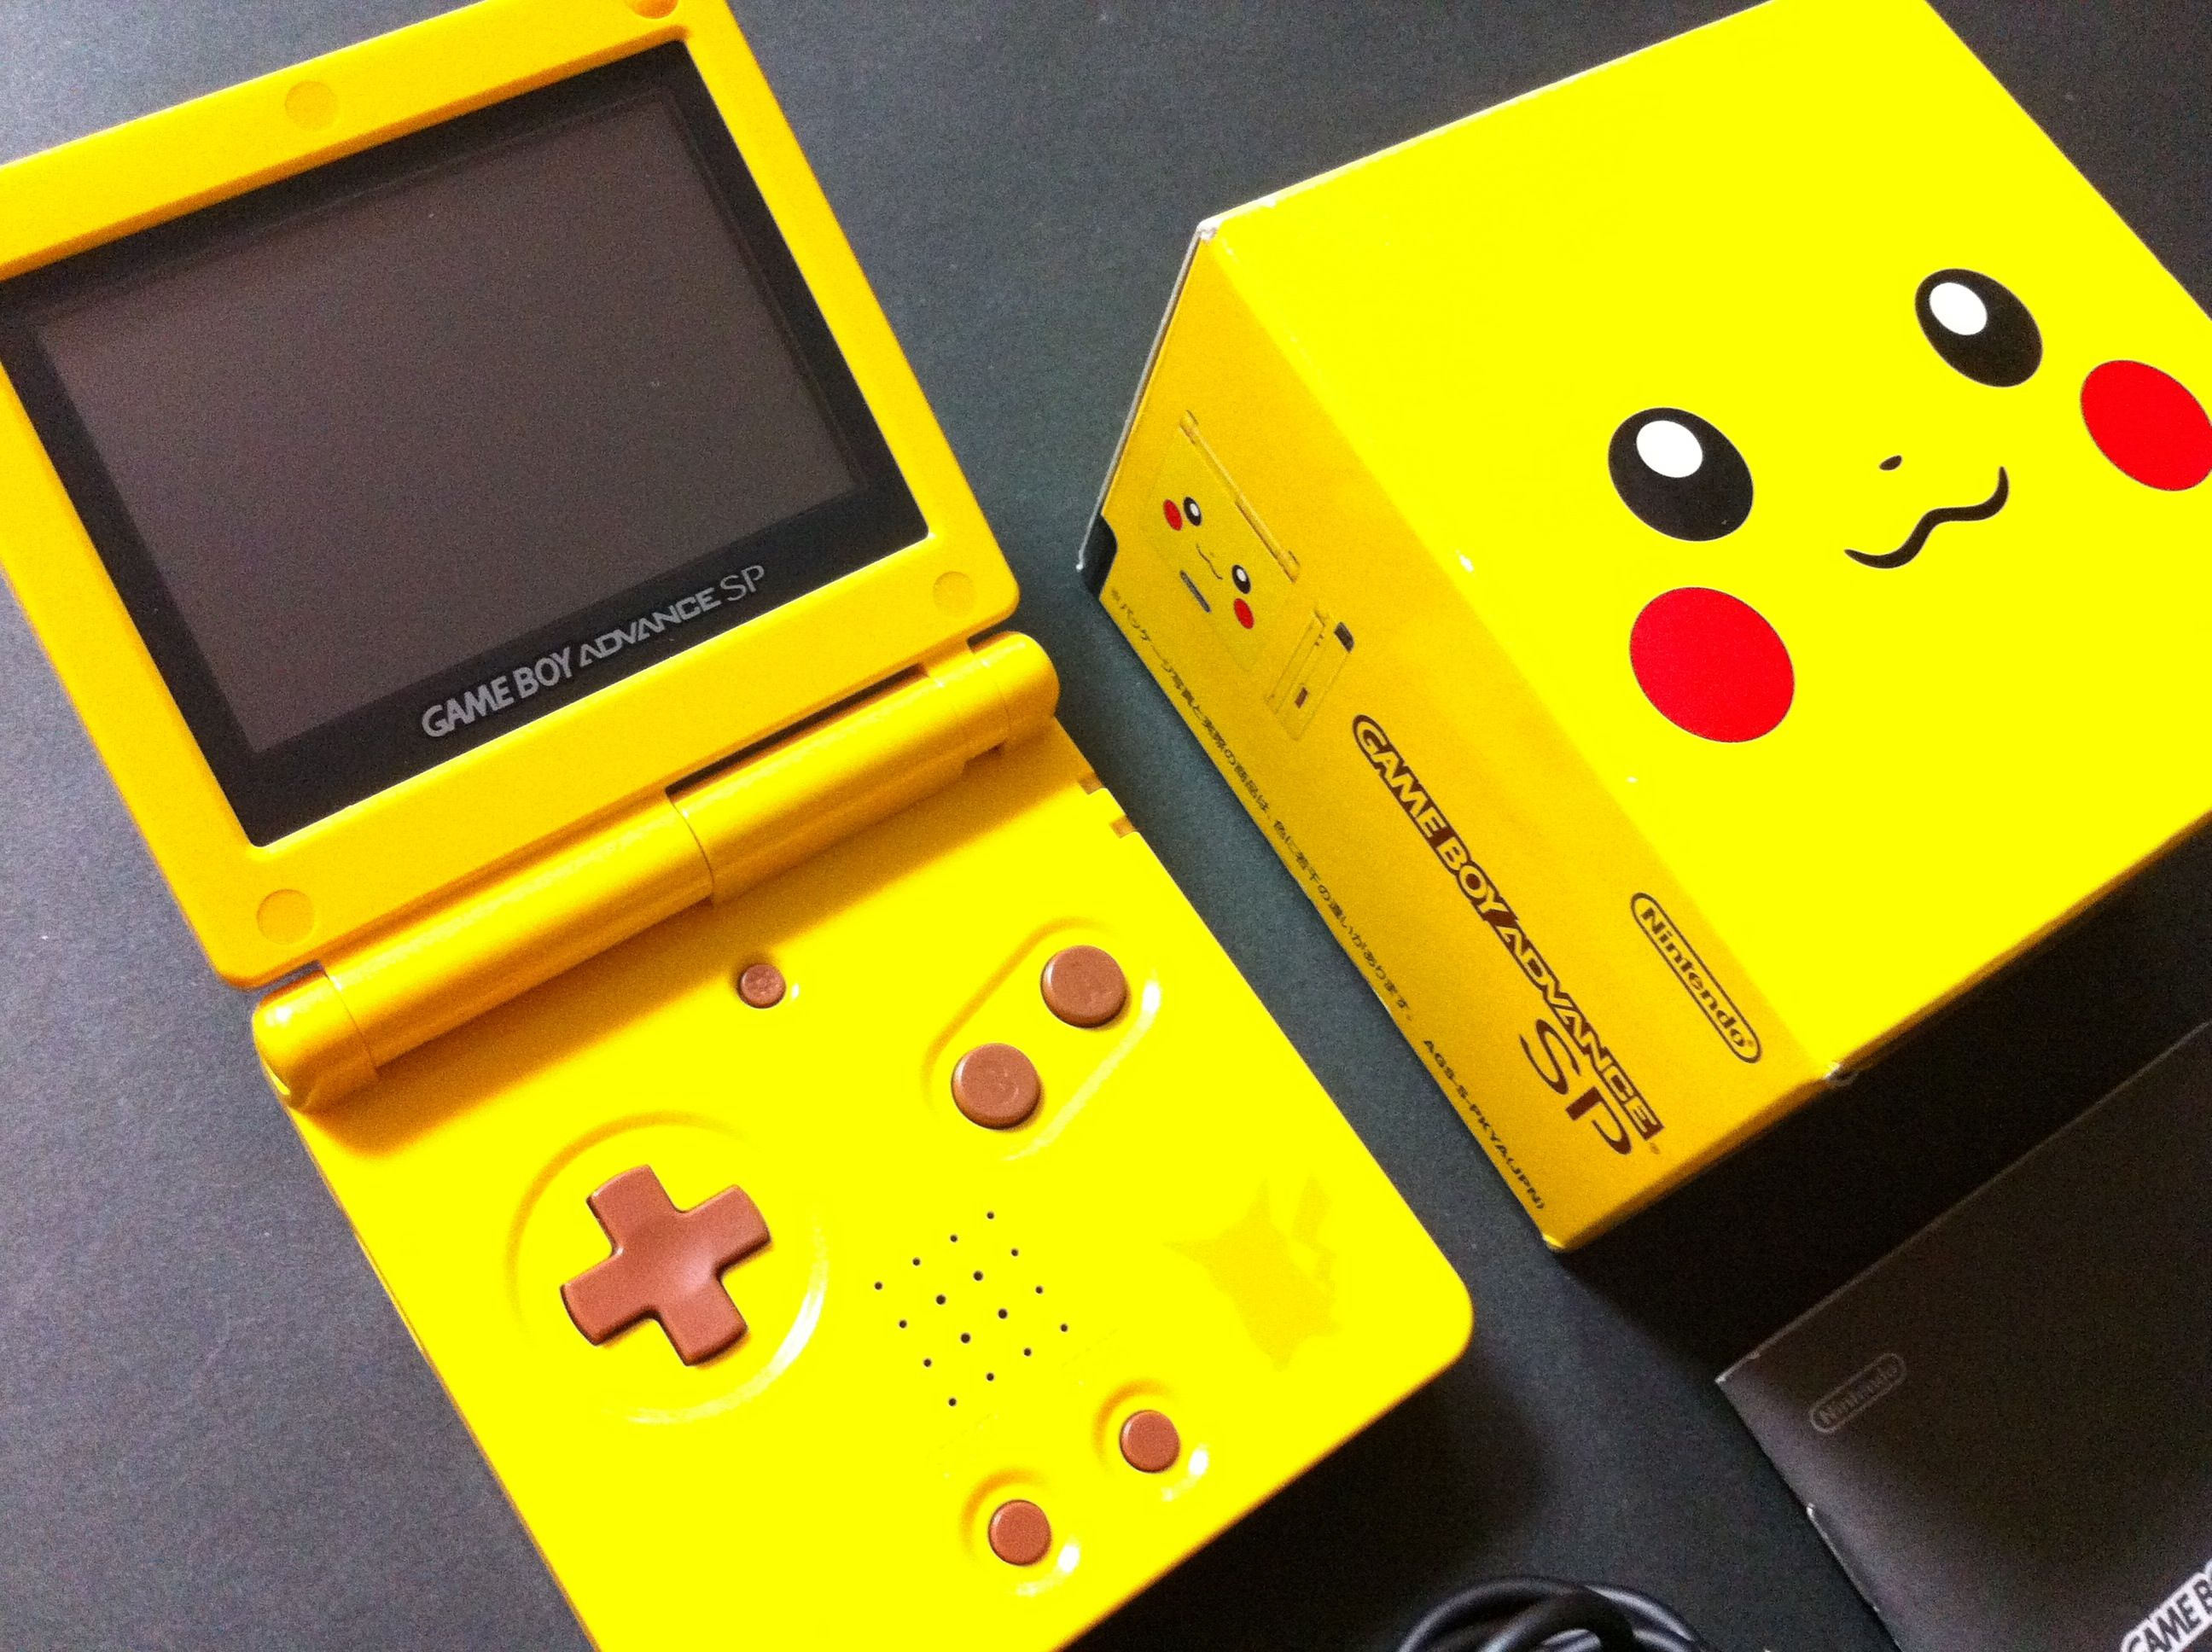 Gameboy Advance Sp Console Pokemon Sapphire Version